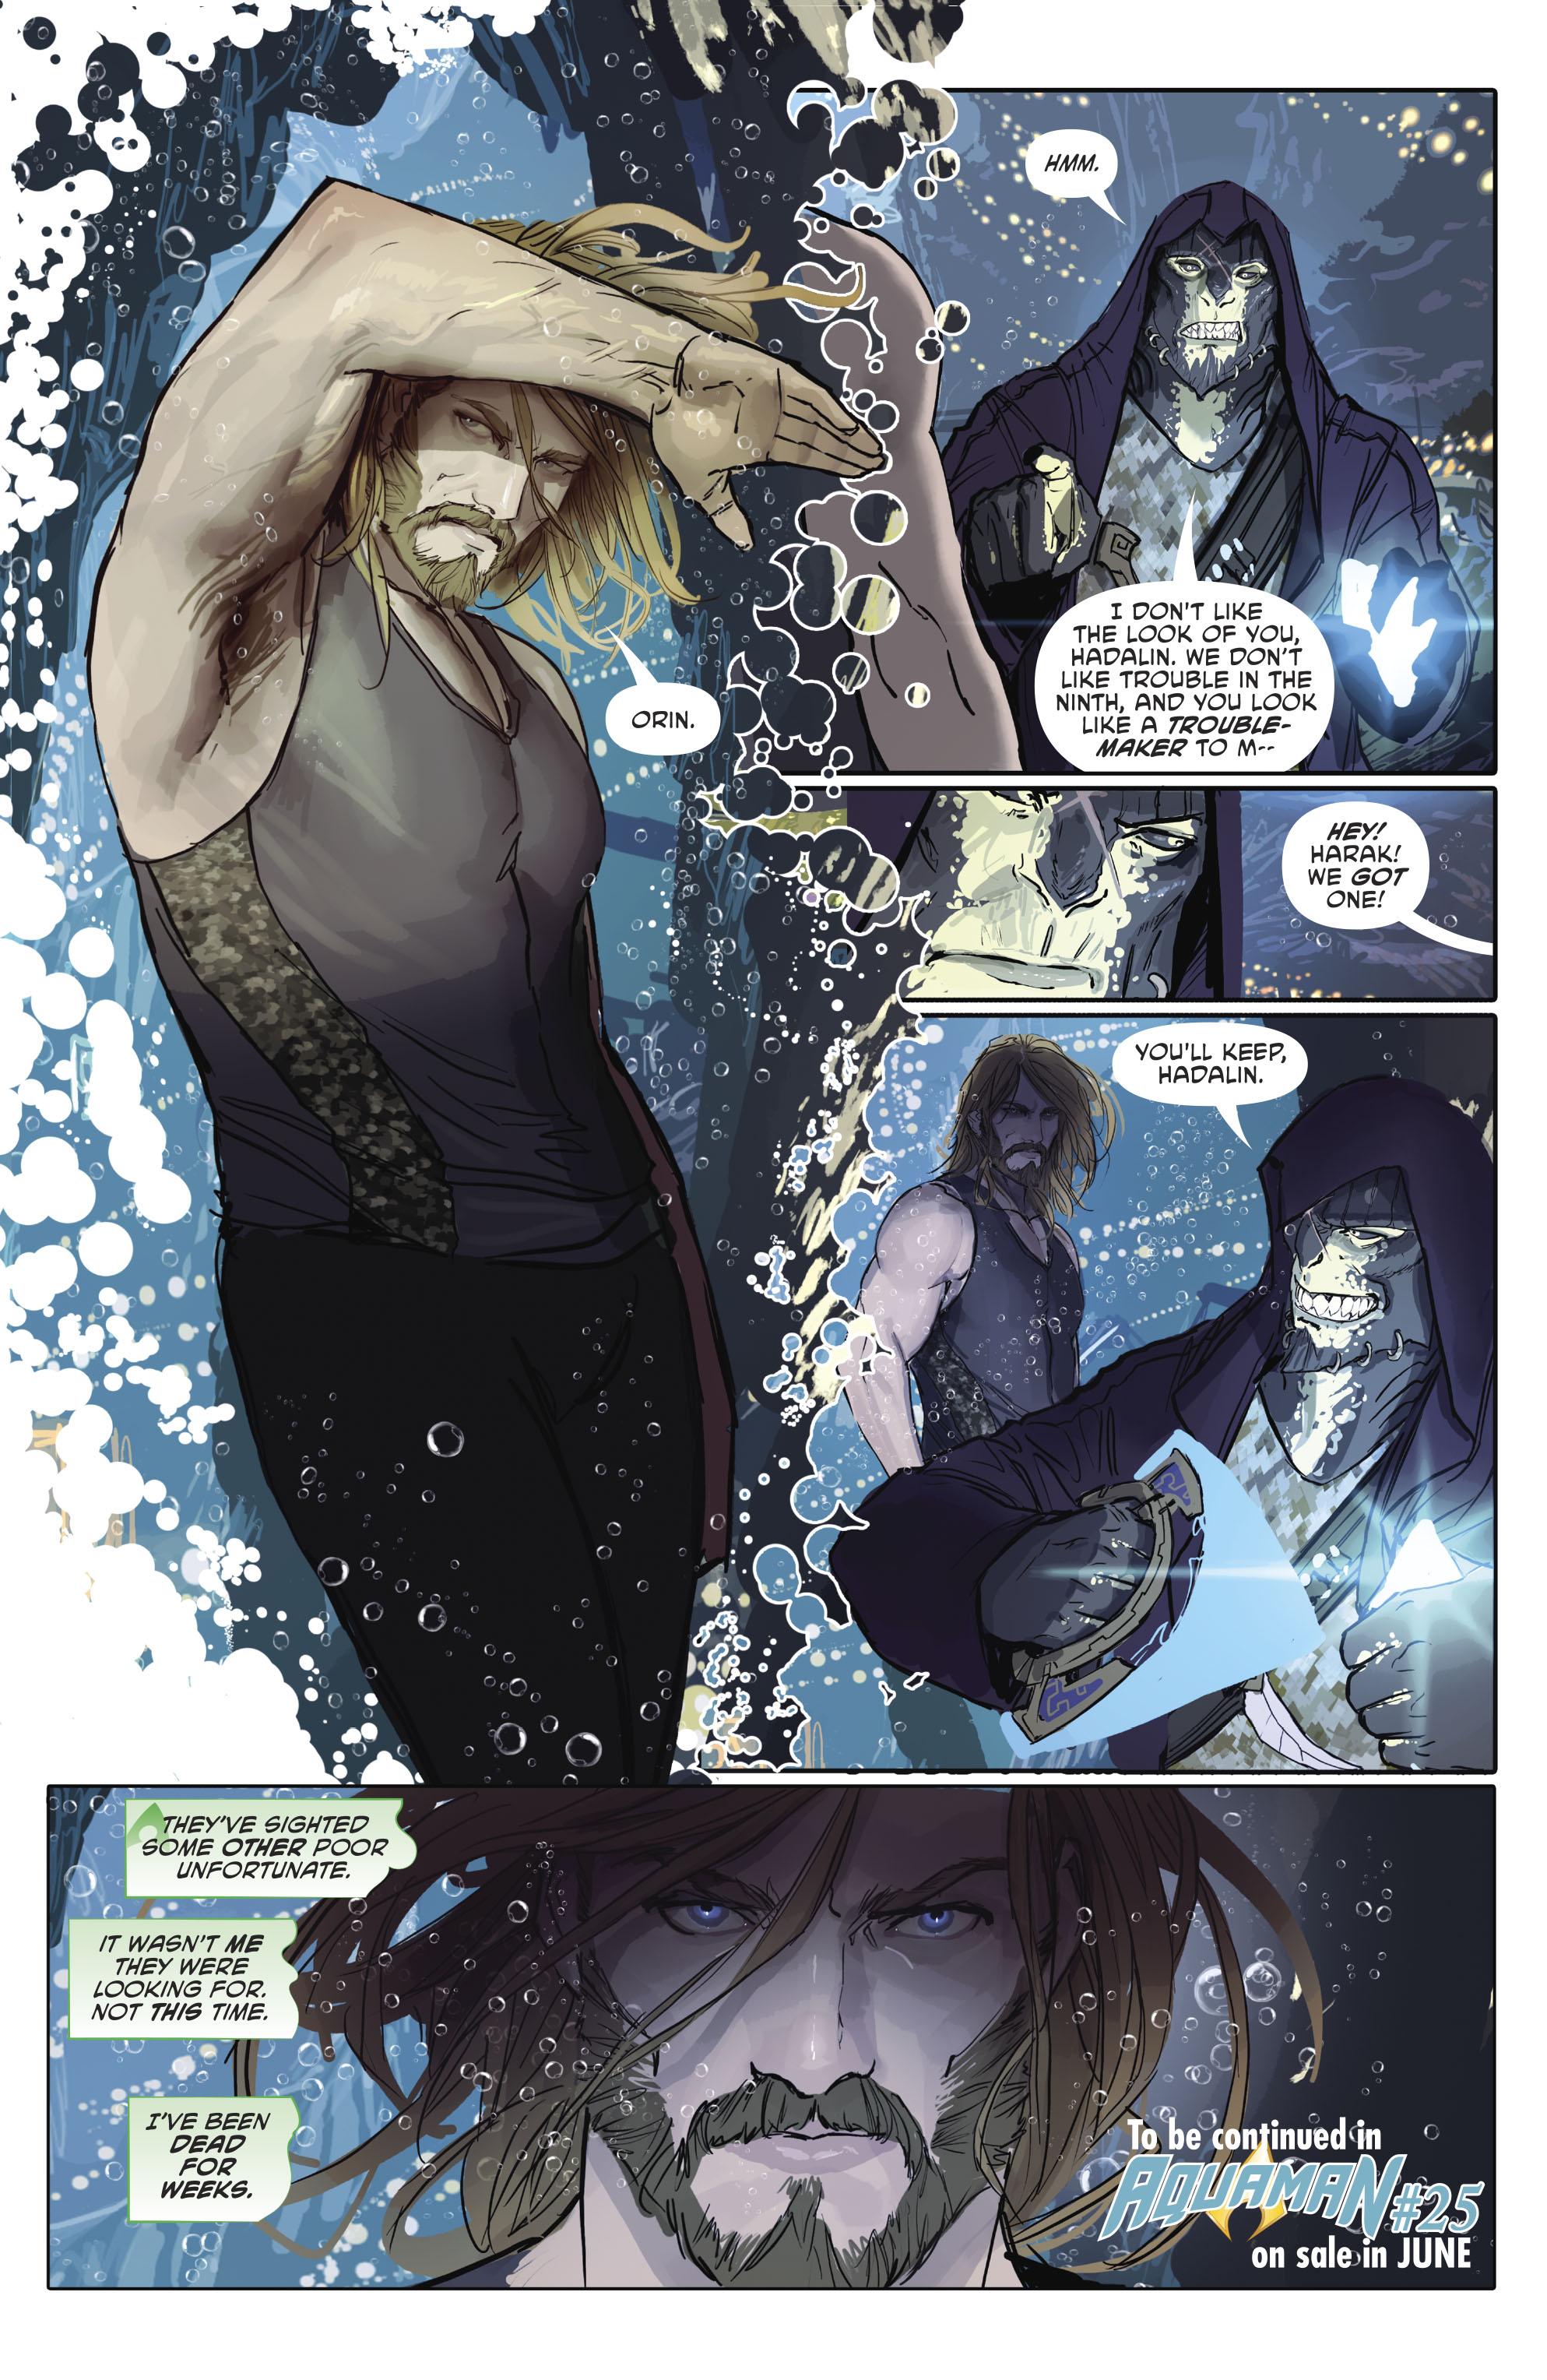 Read online Green Lanterns comic -  Issue #25 - 36